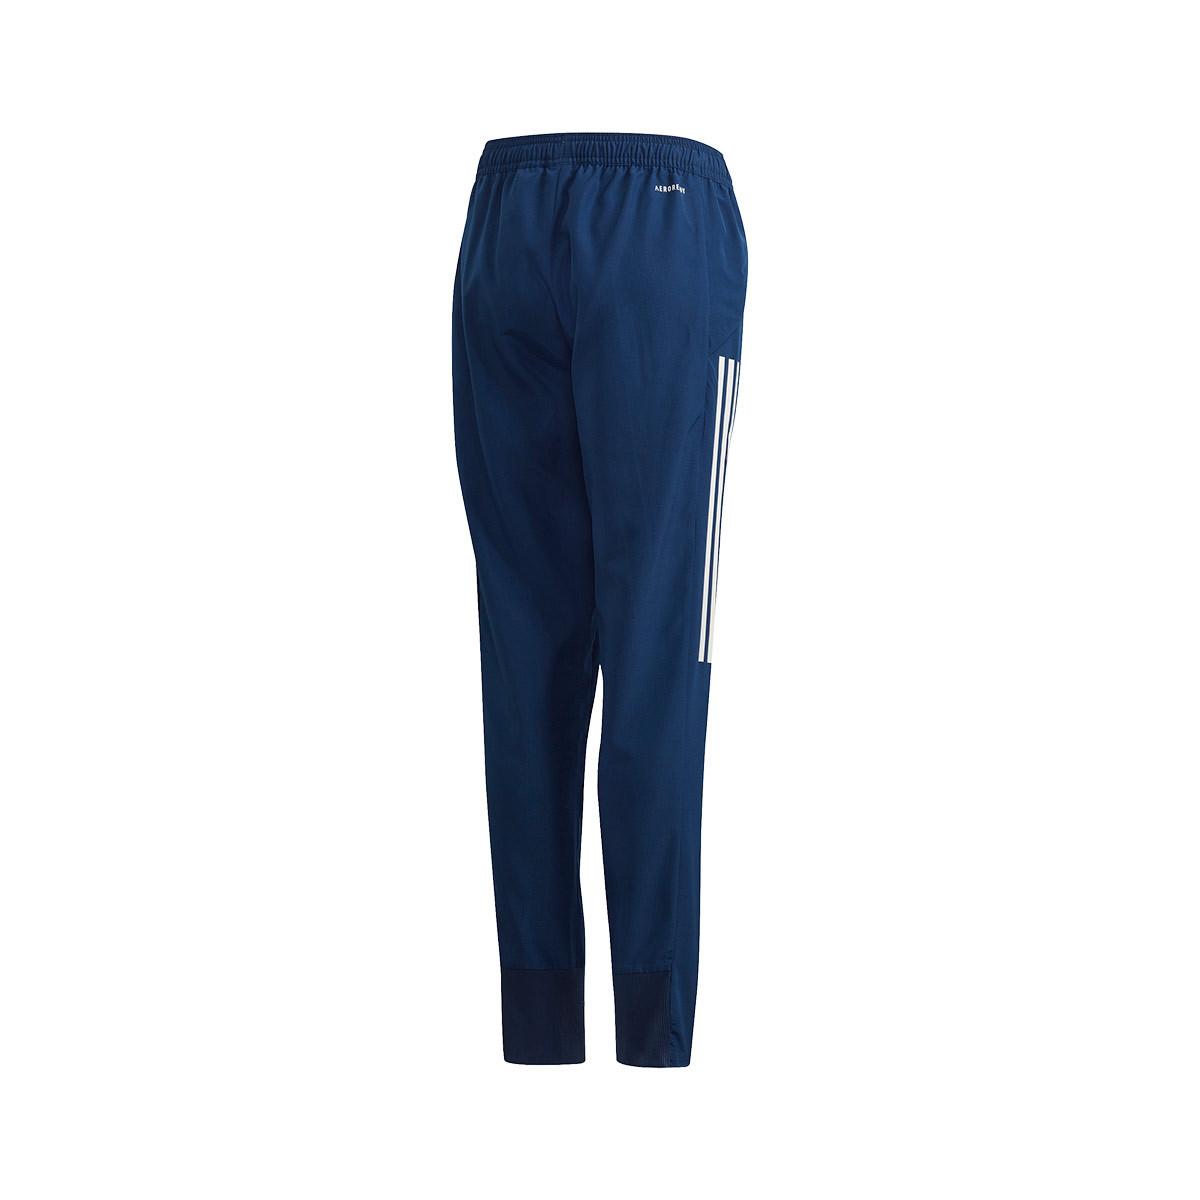 financiero Montaña Comprensión  Long pants adidas Kids Condivo 20 Woven Navy blue - Football store Fútbol  Emotion